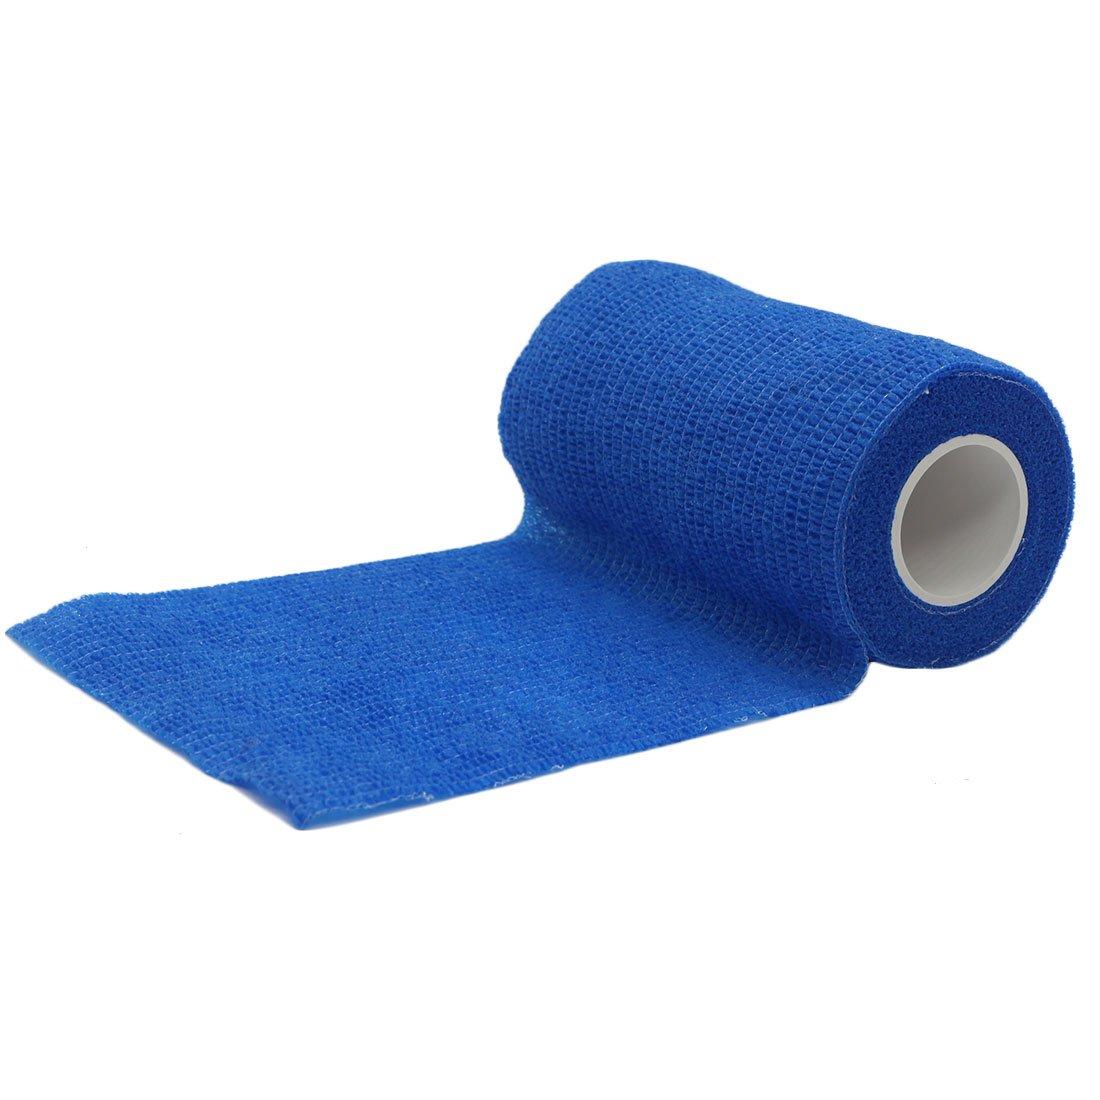 YYF Vet Tape Wrap Bulk,6'' Self Adherent Wrap Tape,Self Adhering Stick Bandage,Self Grip Roll,Stretchable Bandage Wrap Vet Tape - 6'' Inches x 15' Feet (6 Rolls,12 Rolls,18 Rolls,24 Rolls,Single Roll)